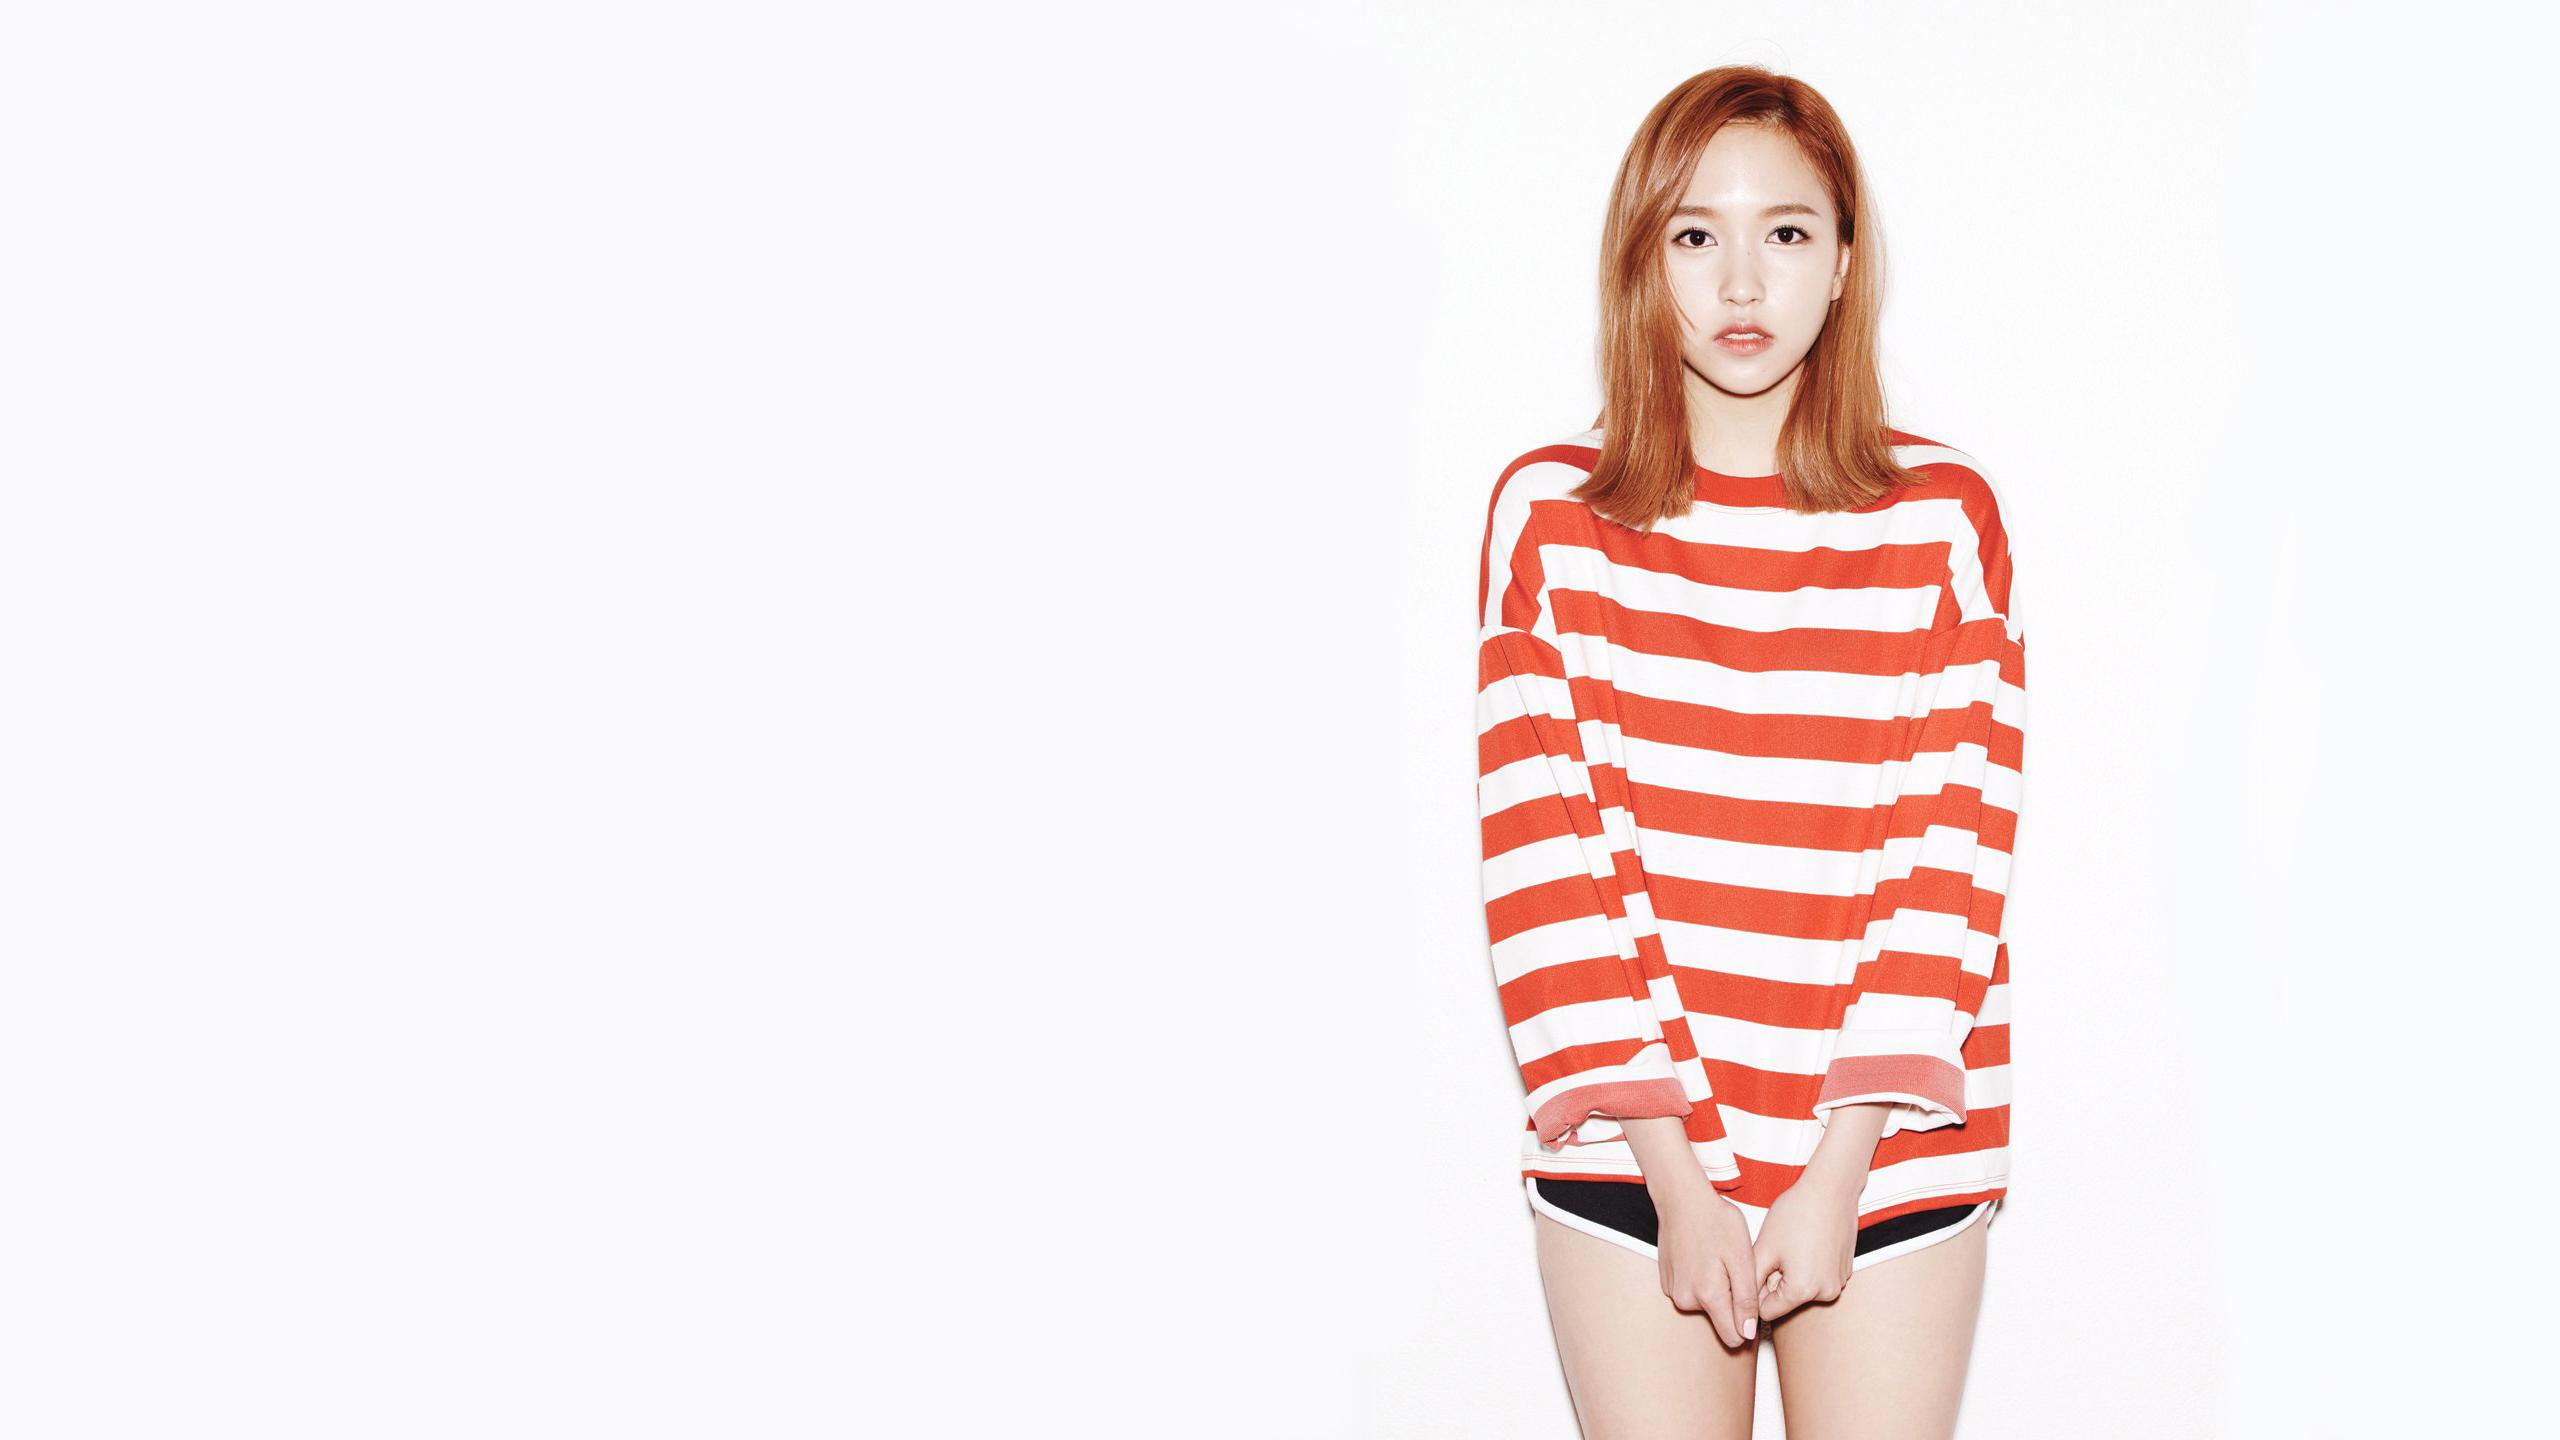 Twice Mina Cute Hd Wallpaper Background Image 2560x1440 Id